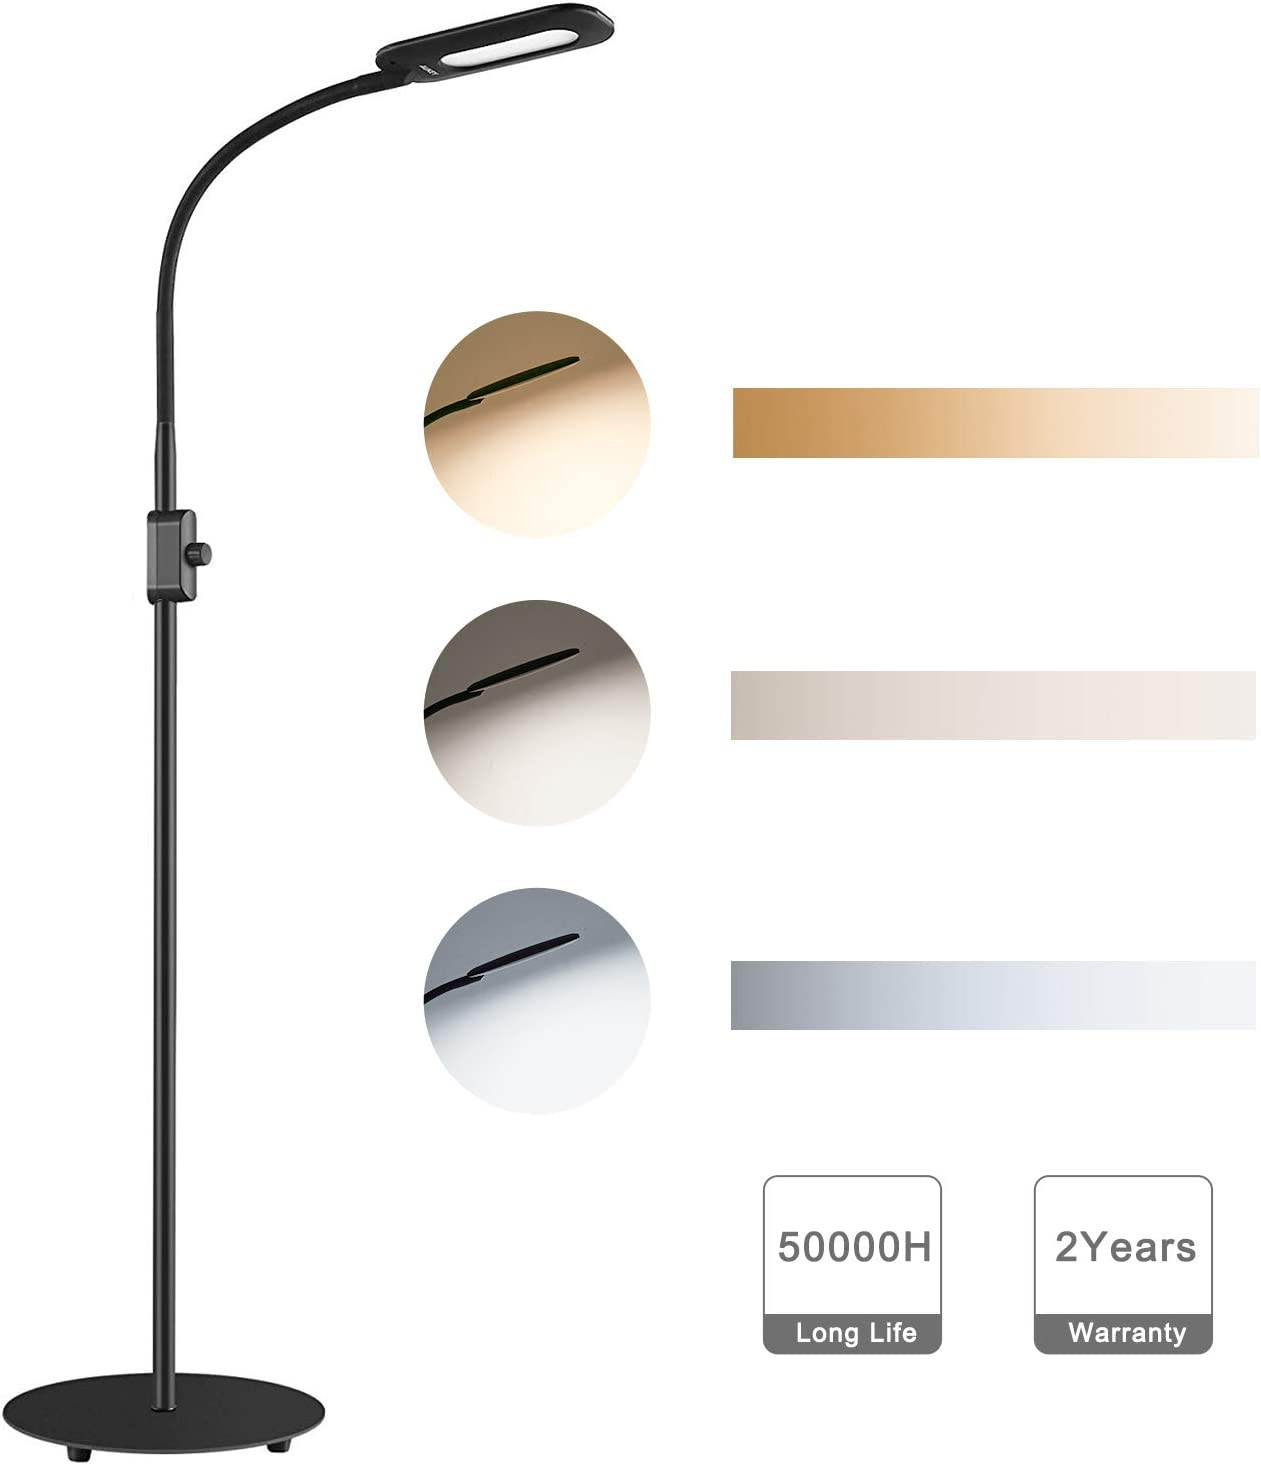 Aukey Led Stehlampe 3 Farbtemperaturen Dimmbare